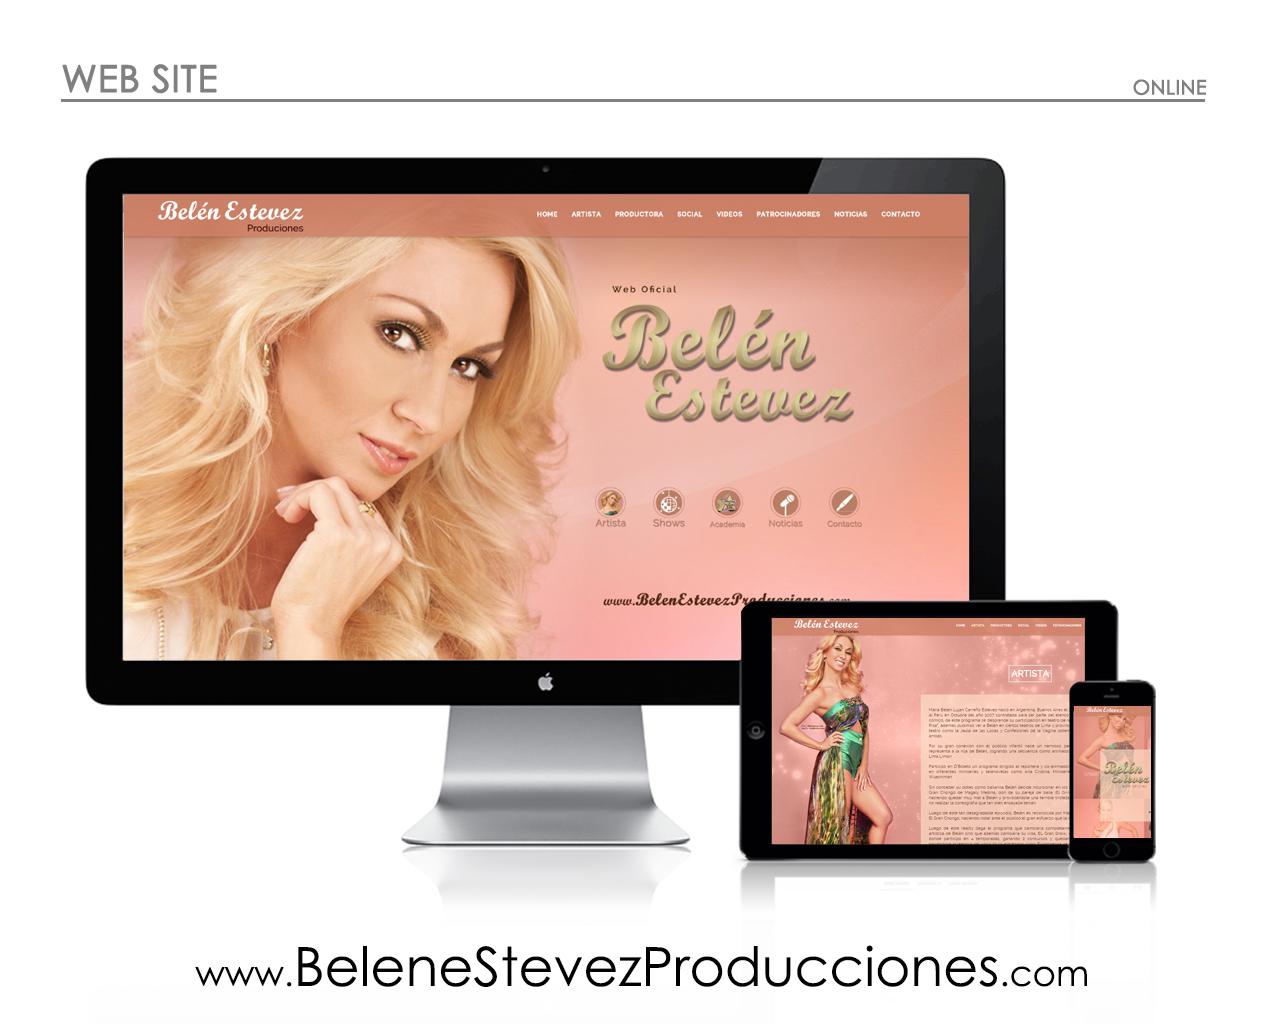 belen_stecens_web